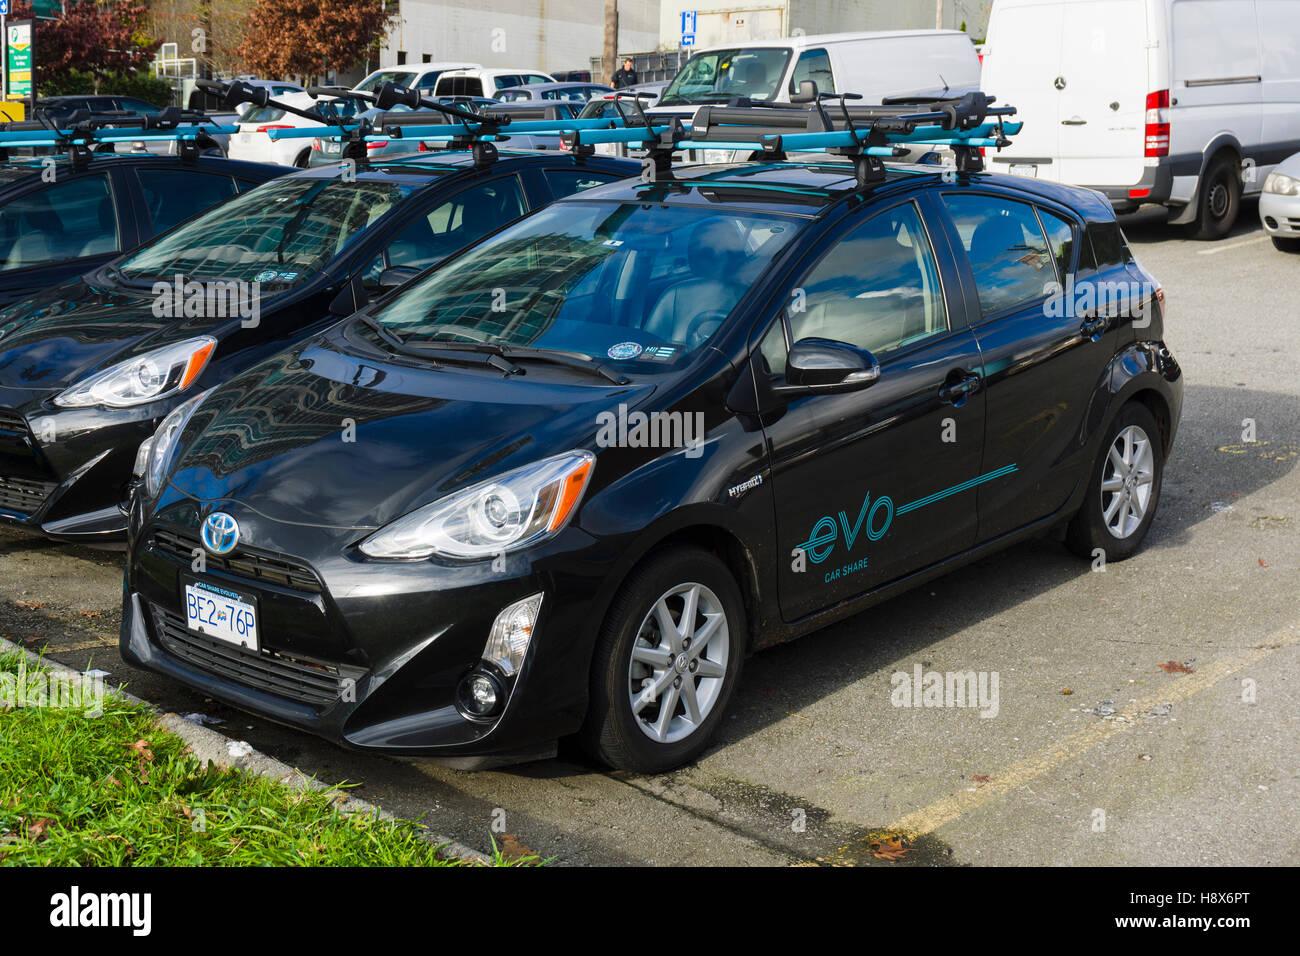 Evo compartir auto, Vancouver, BC, Canadá. Imagen De Stock